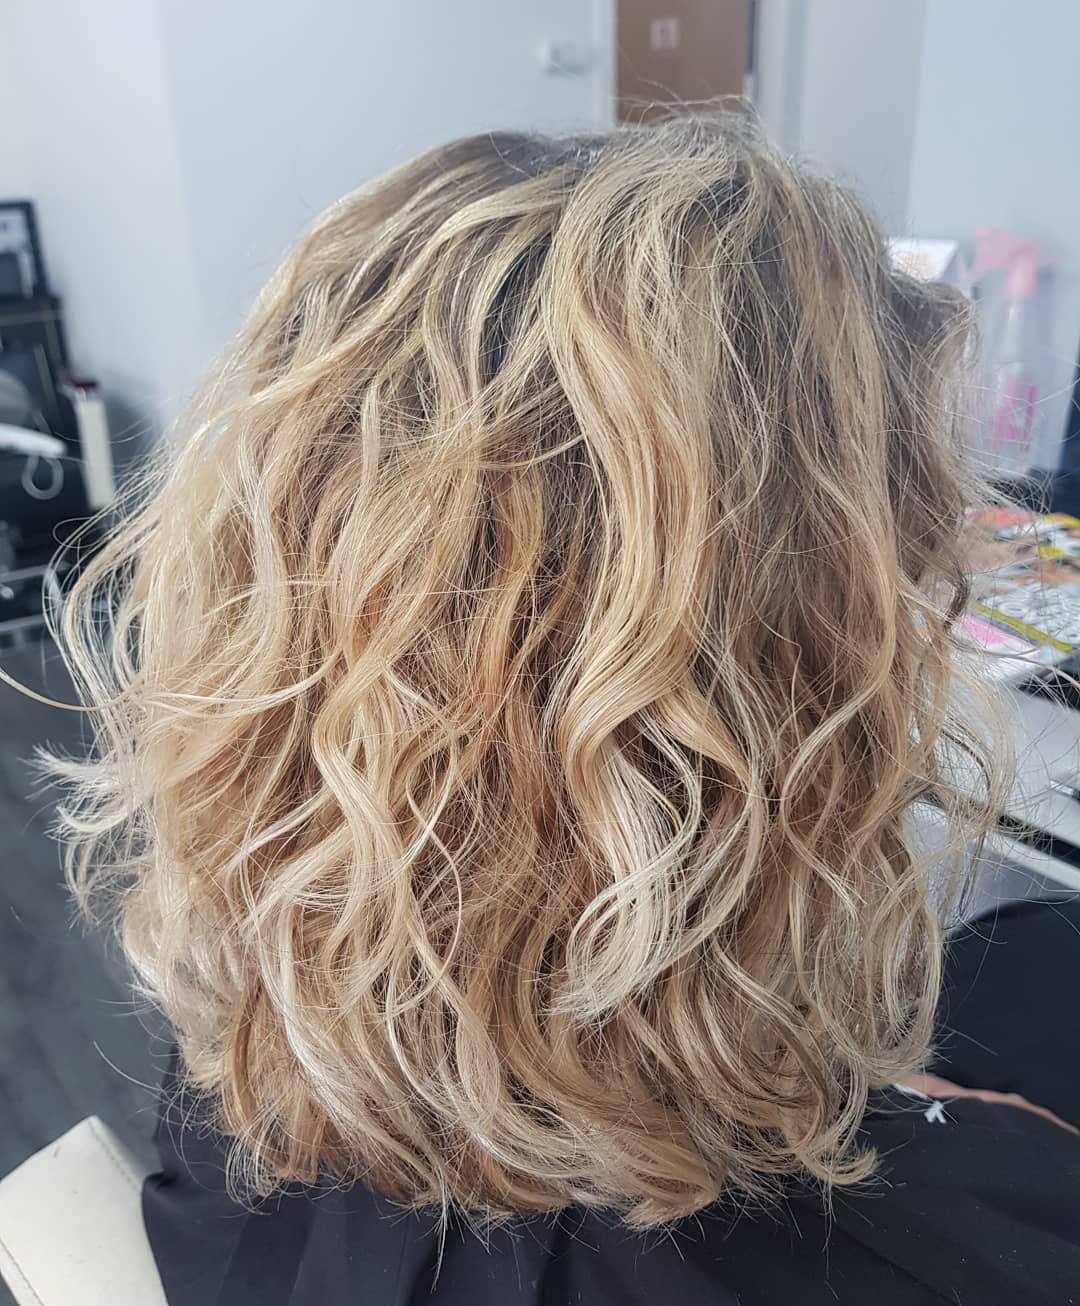 30 Stunning Summer Lob Haircuts We Love (July 2019